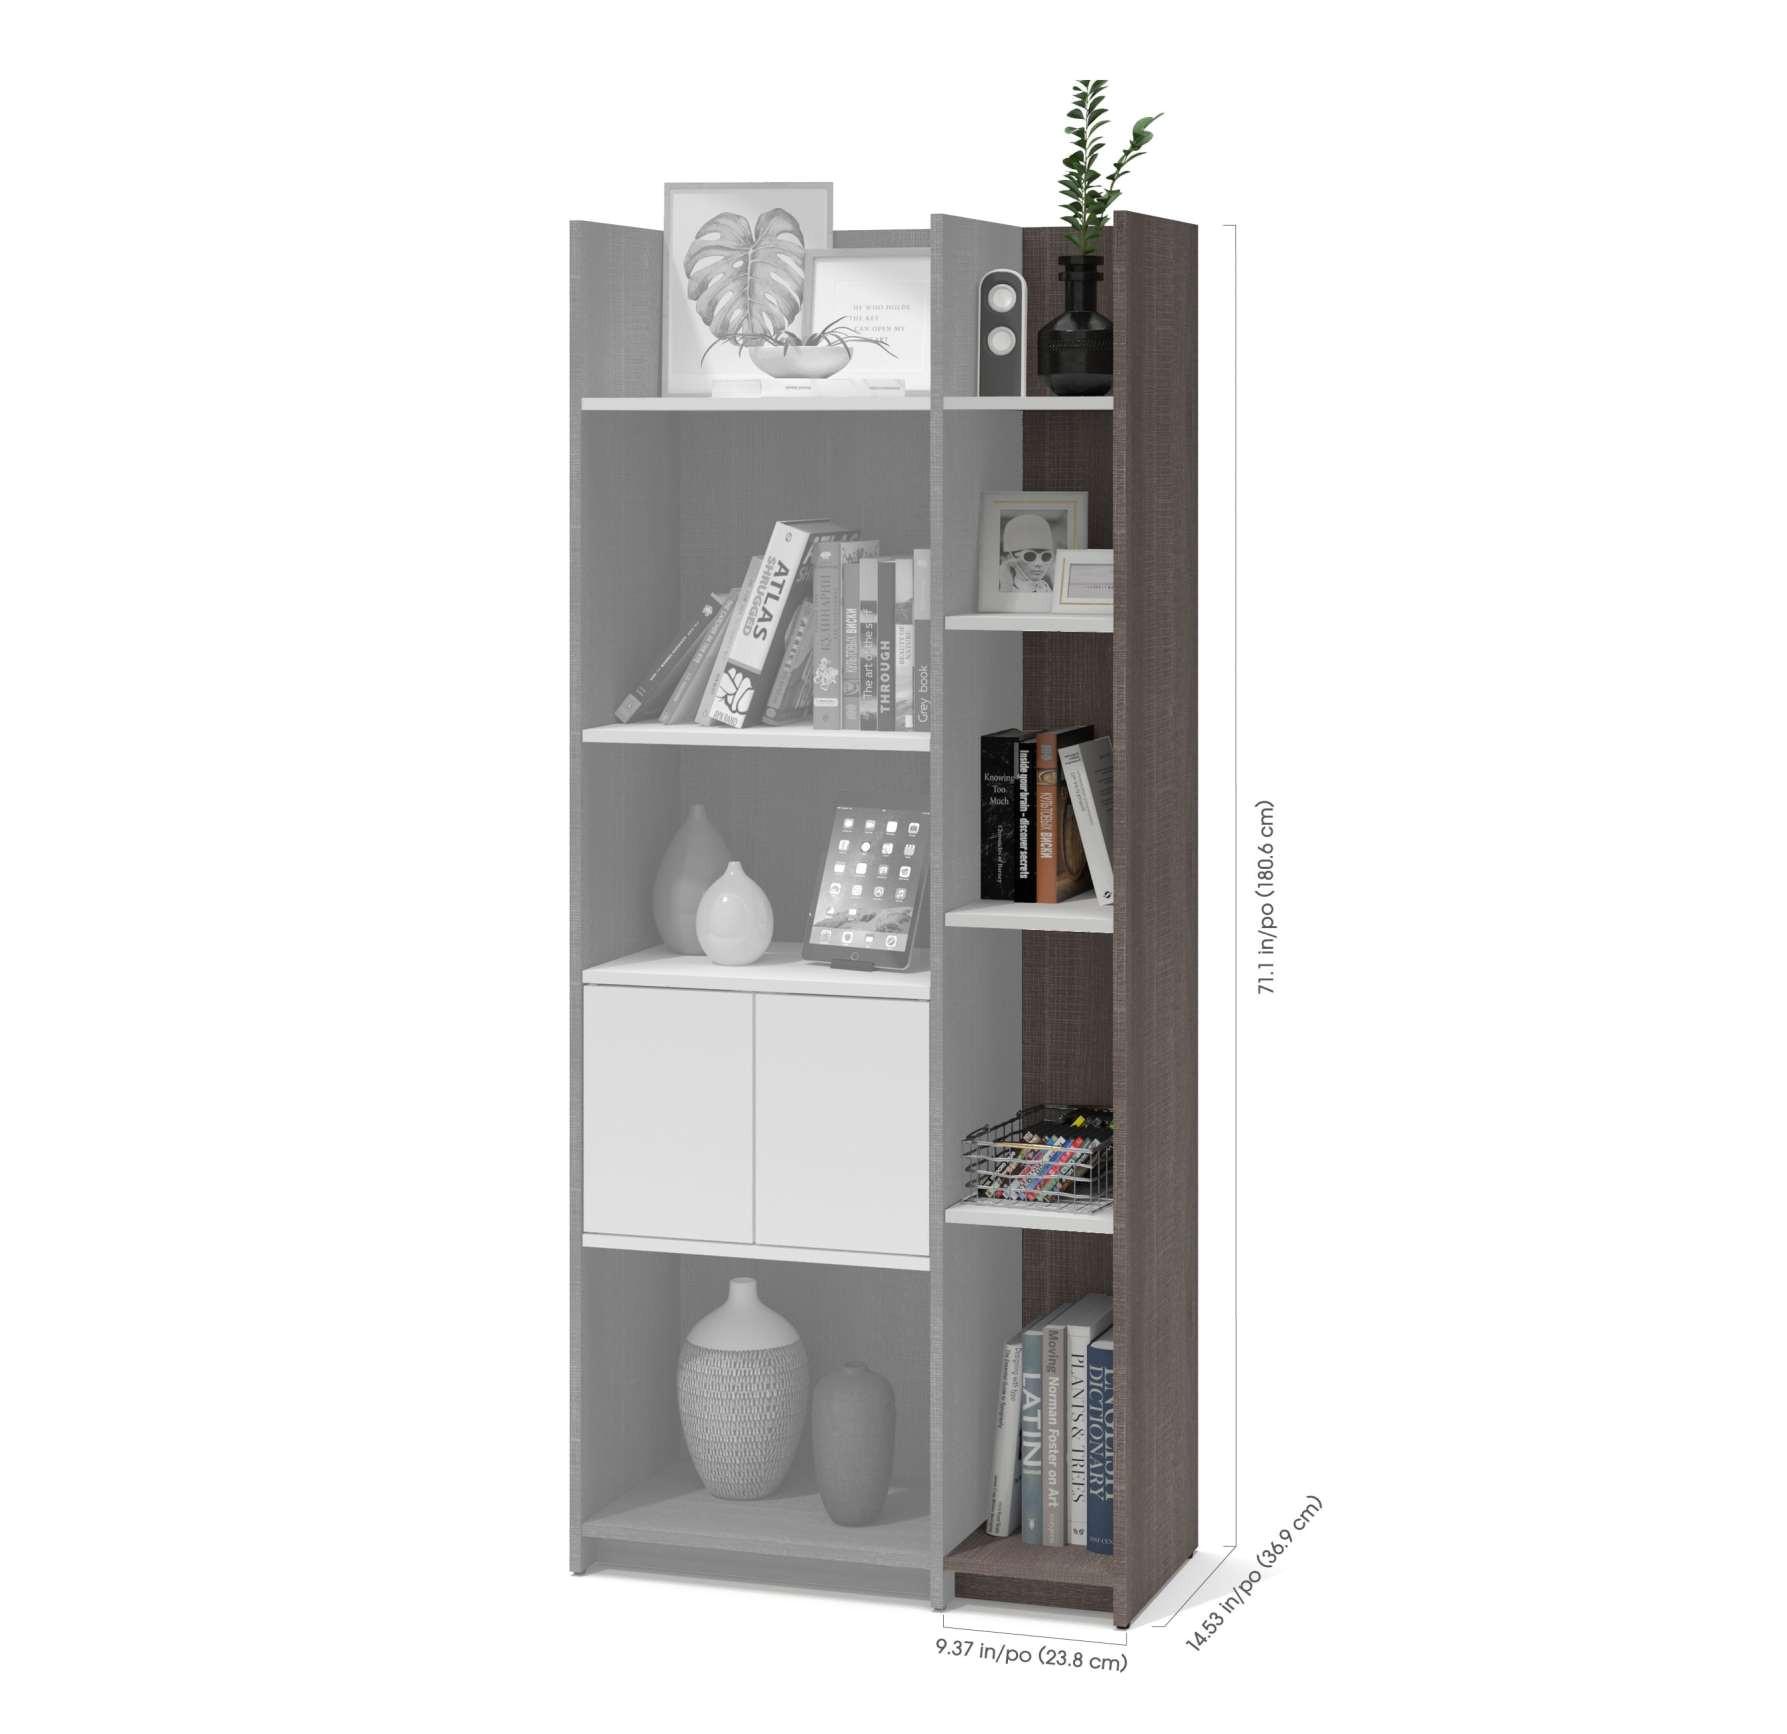 ikea rolling storage also inspirational 9 box shelf unique shelves for bedroom unique beautiful bedroom